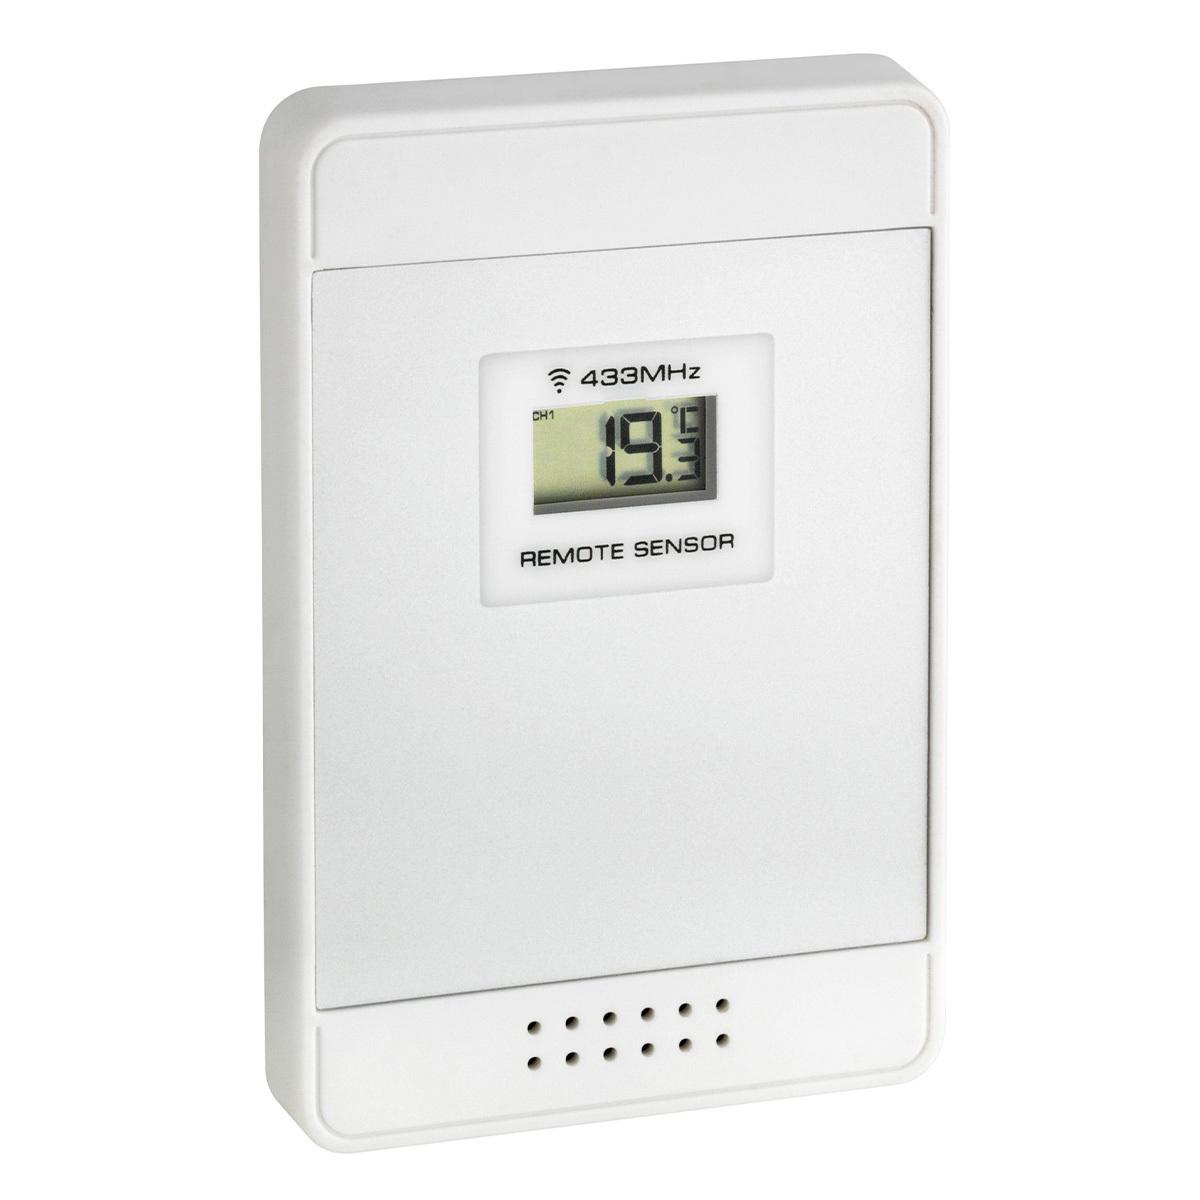 30-3055-01-funk-thermometer-joker-sender-1200x1200px.jpg